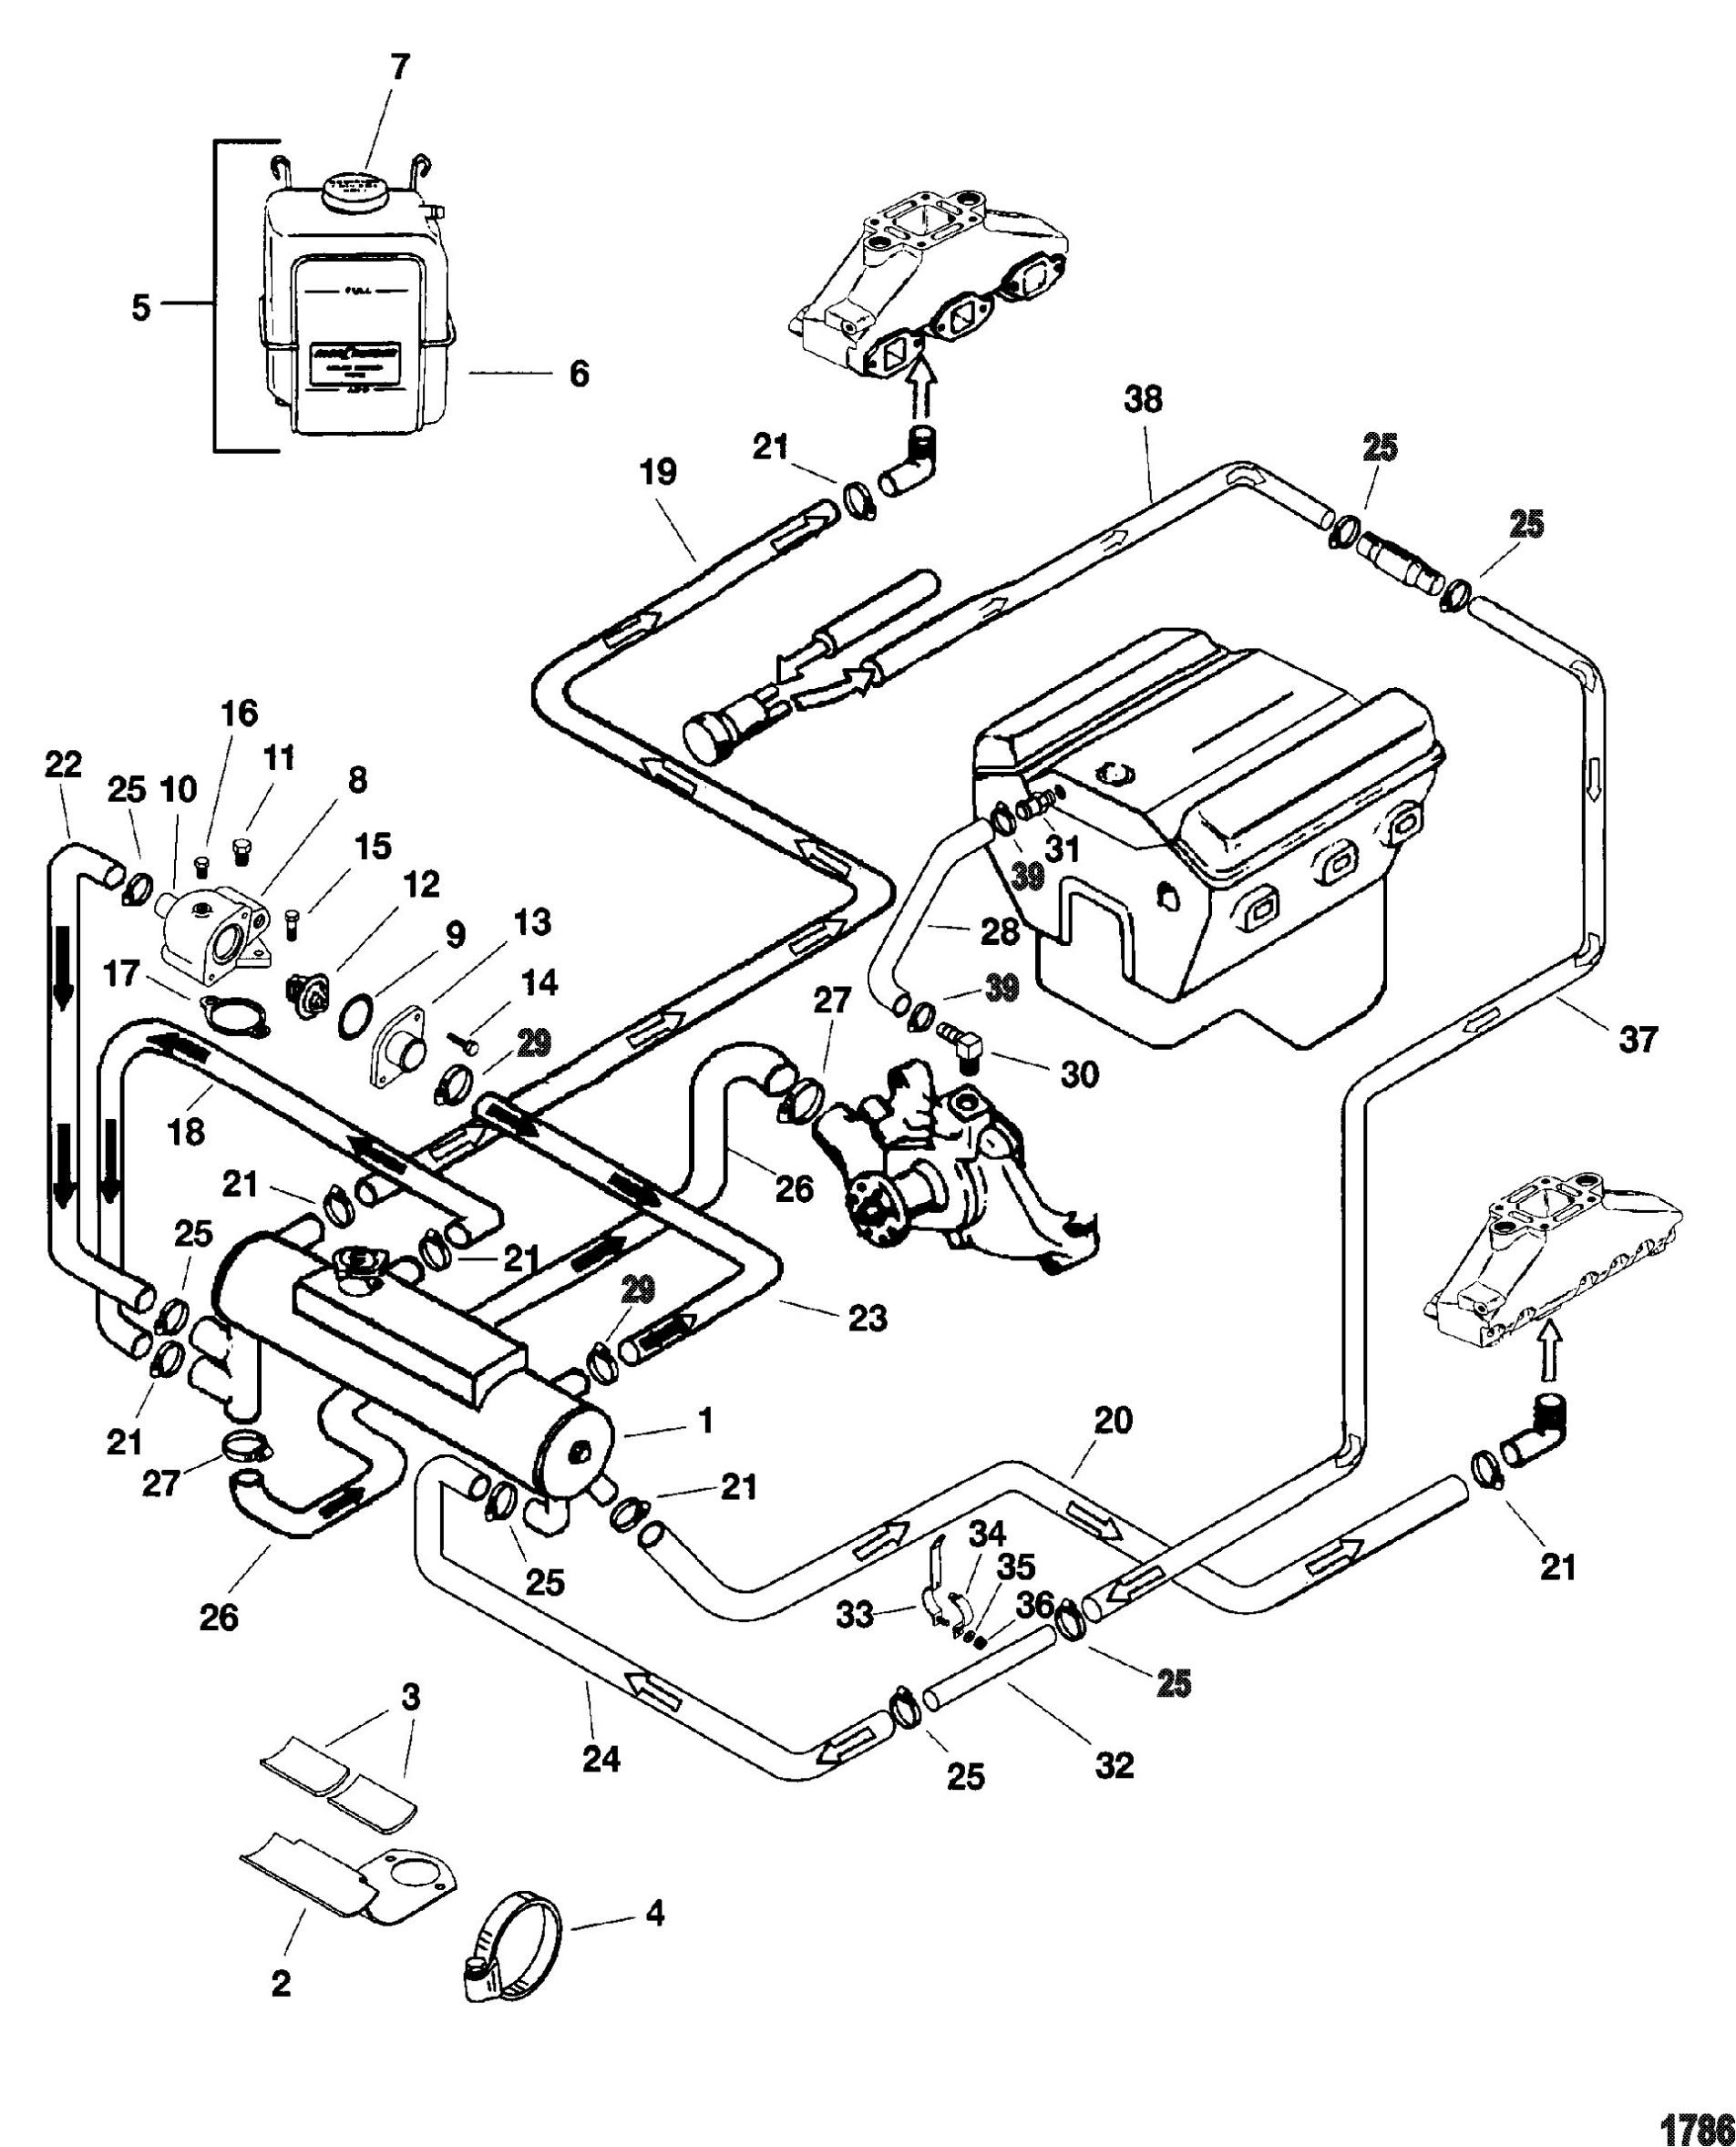 2004 Buick Rendezvous Abs Brake Line Diagram